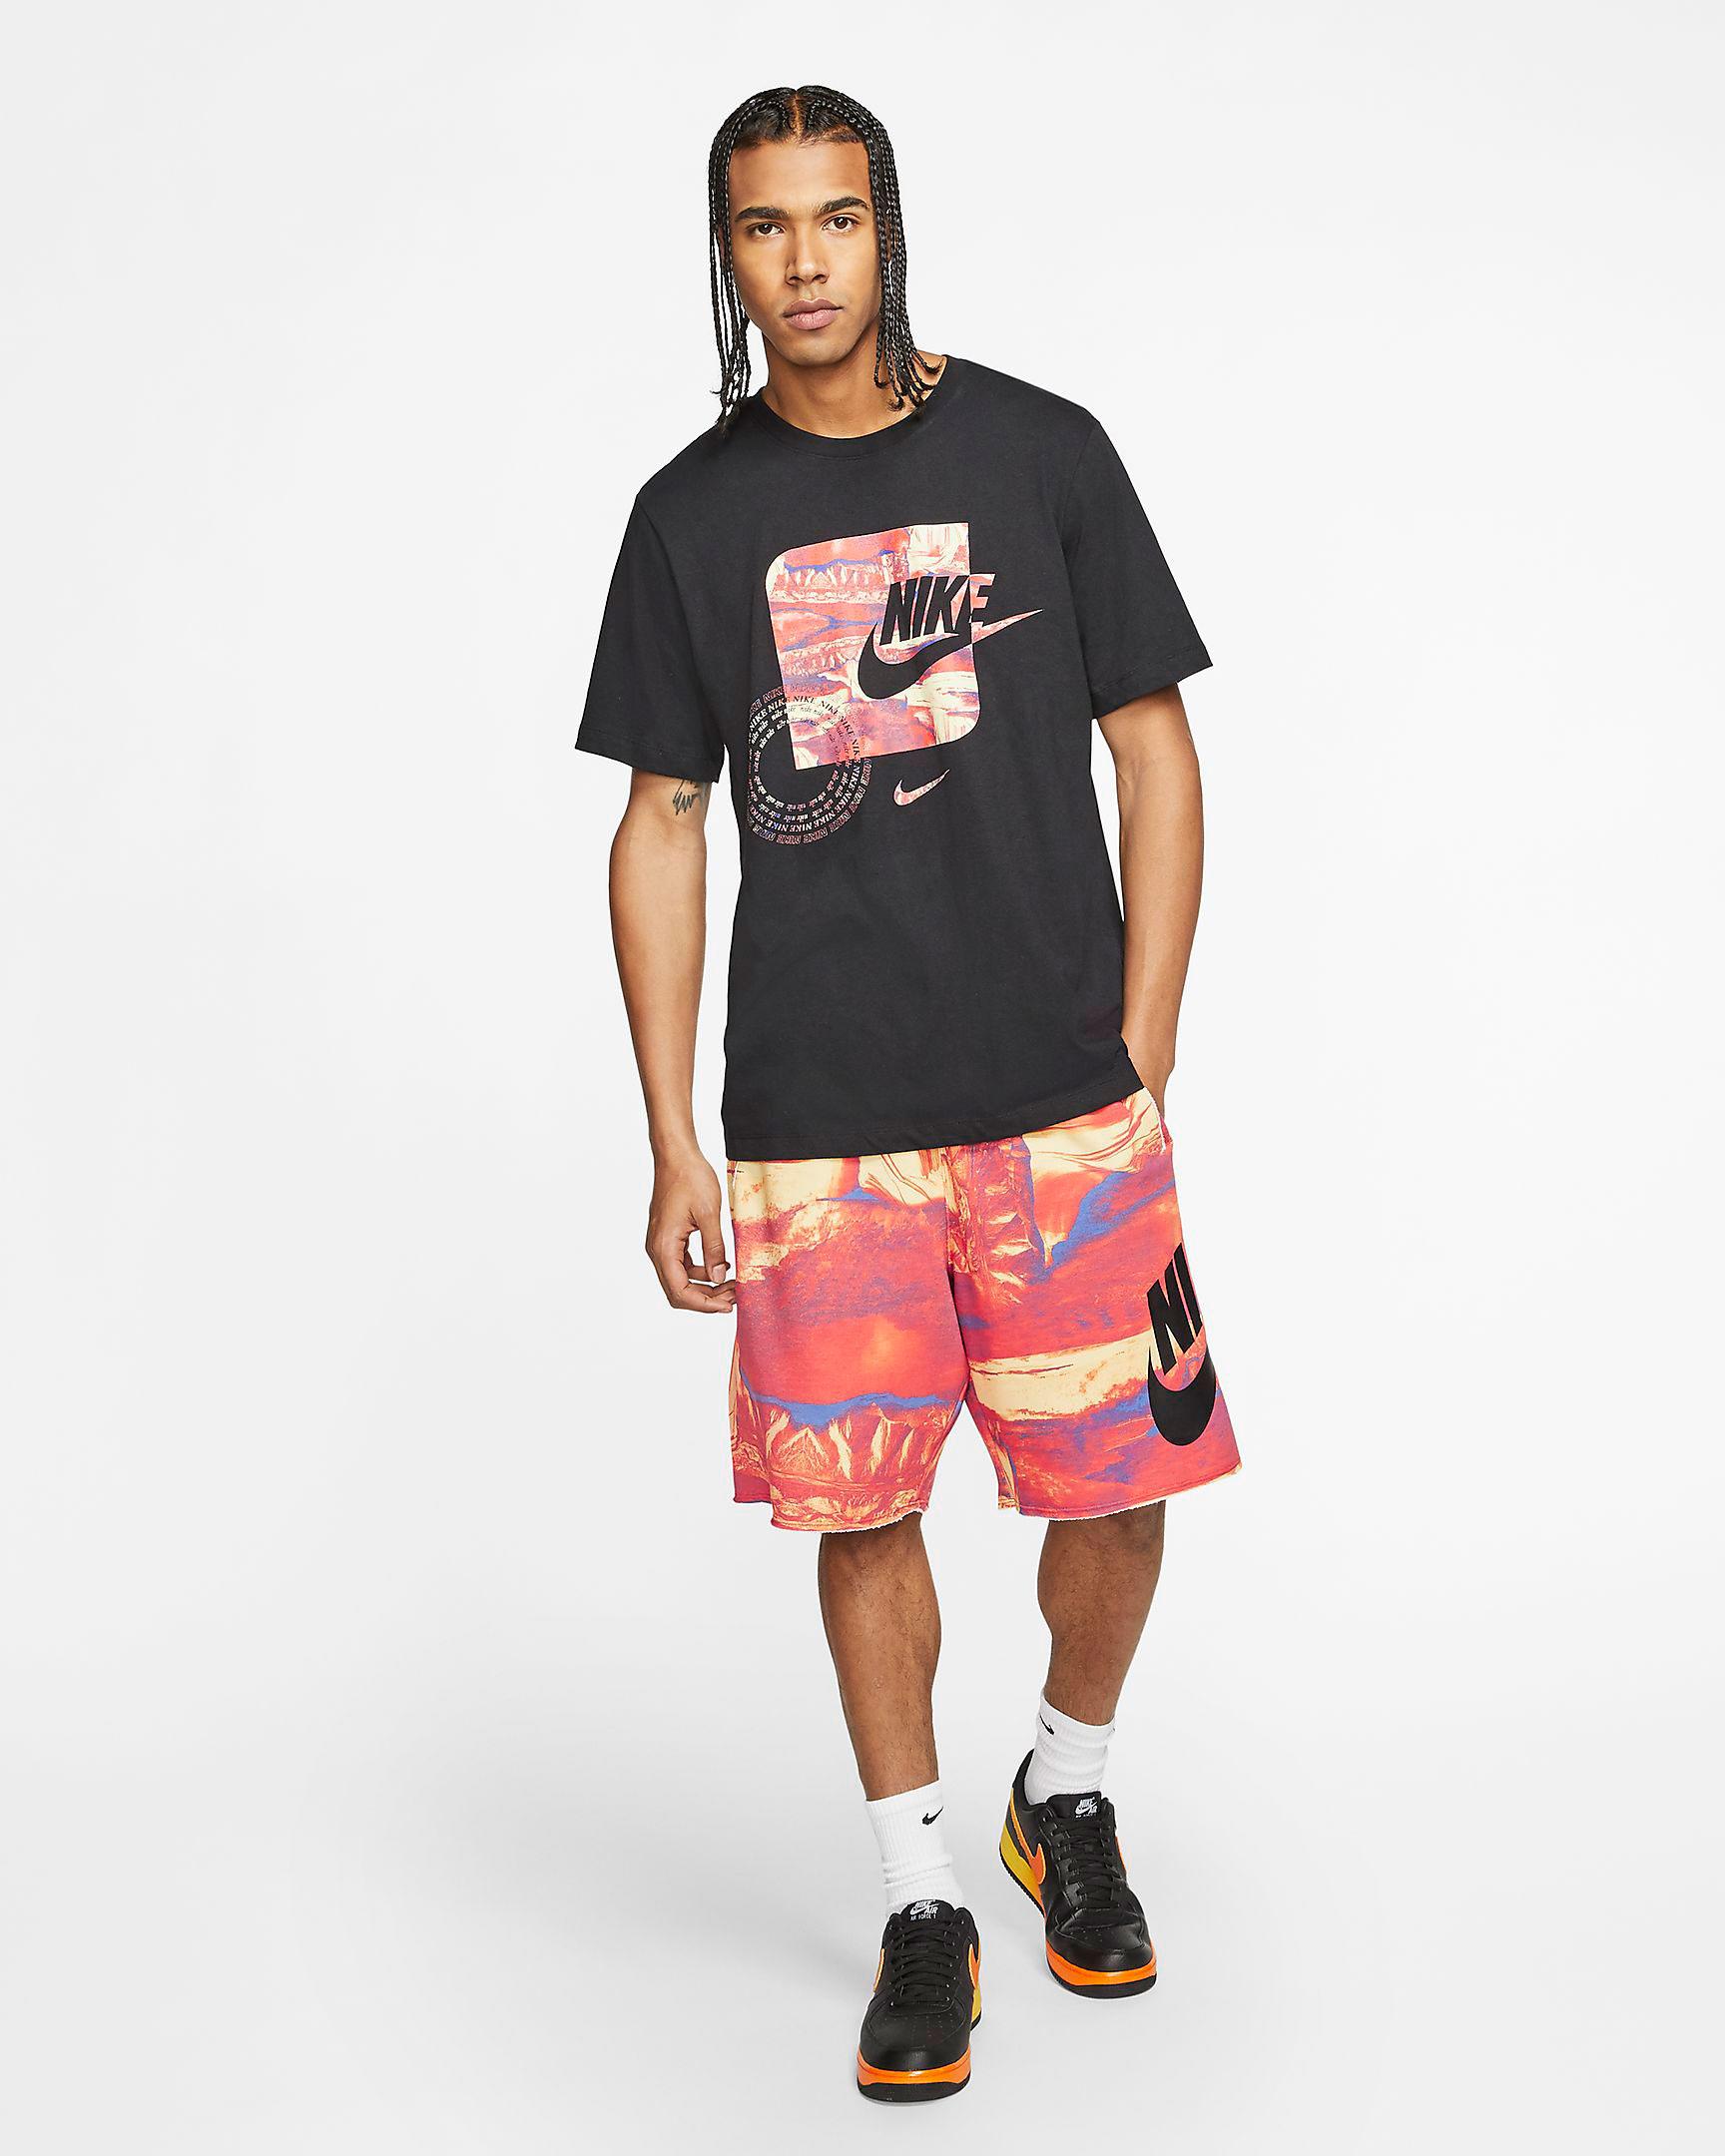 nike-organic-distortion-shirt-shorts